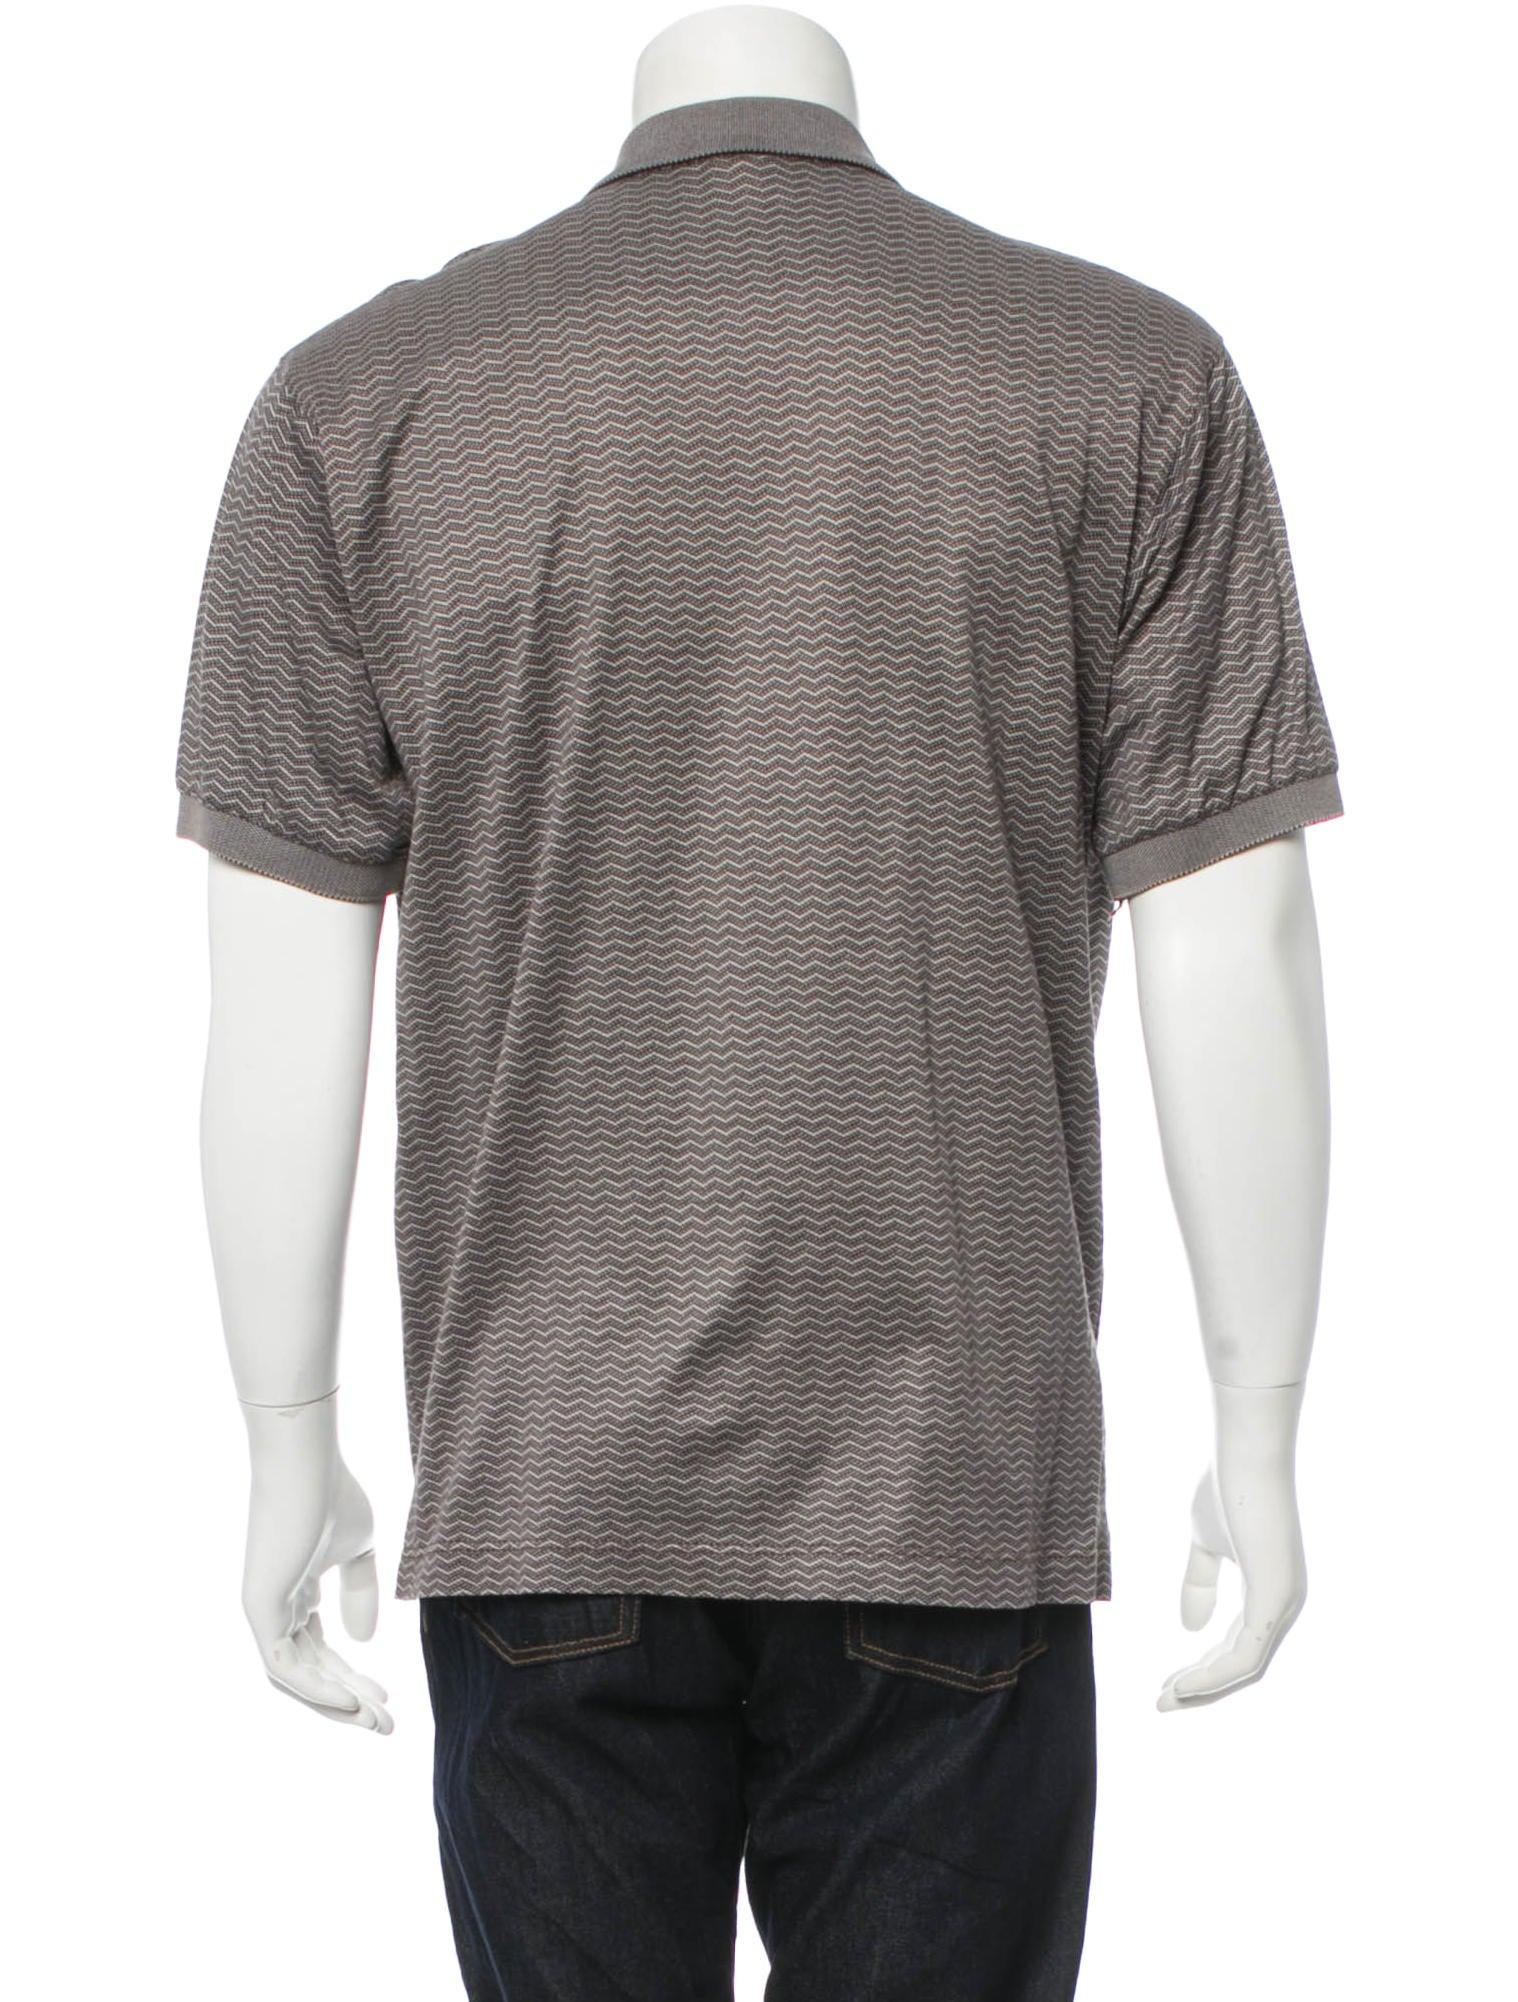 Ermenegildo zegna polo shirt mens shirts zgn21763 for Zegna polo shirts sale